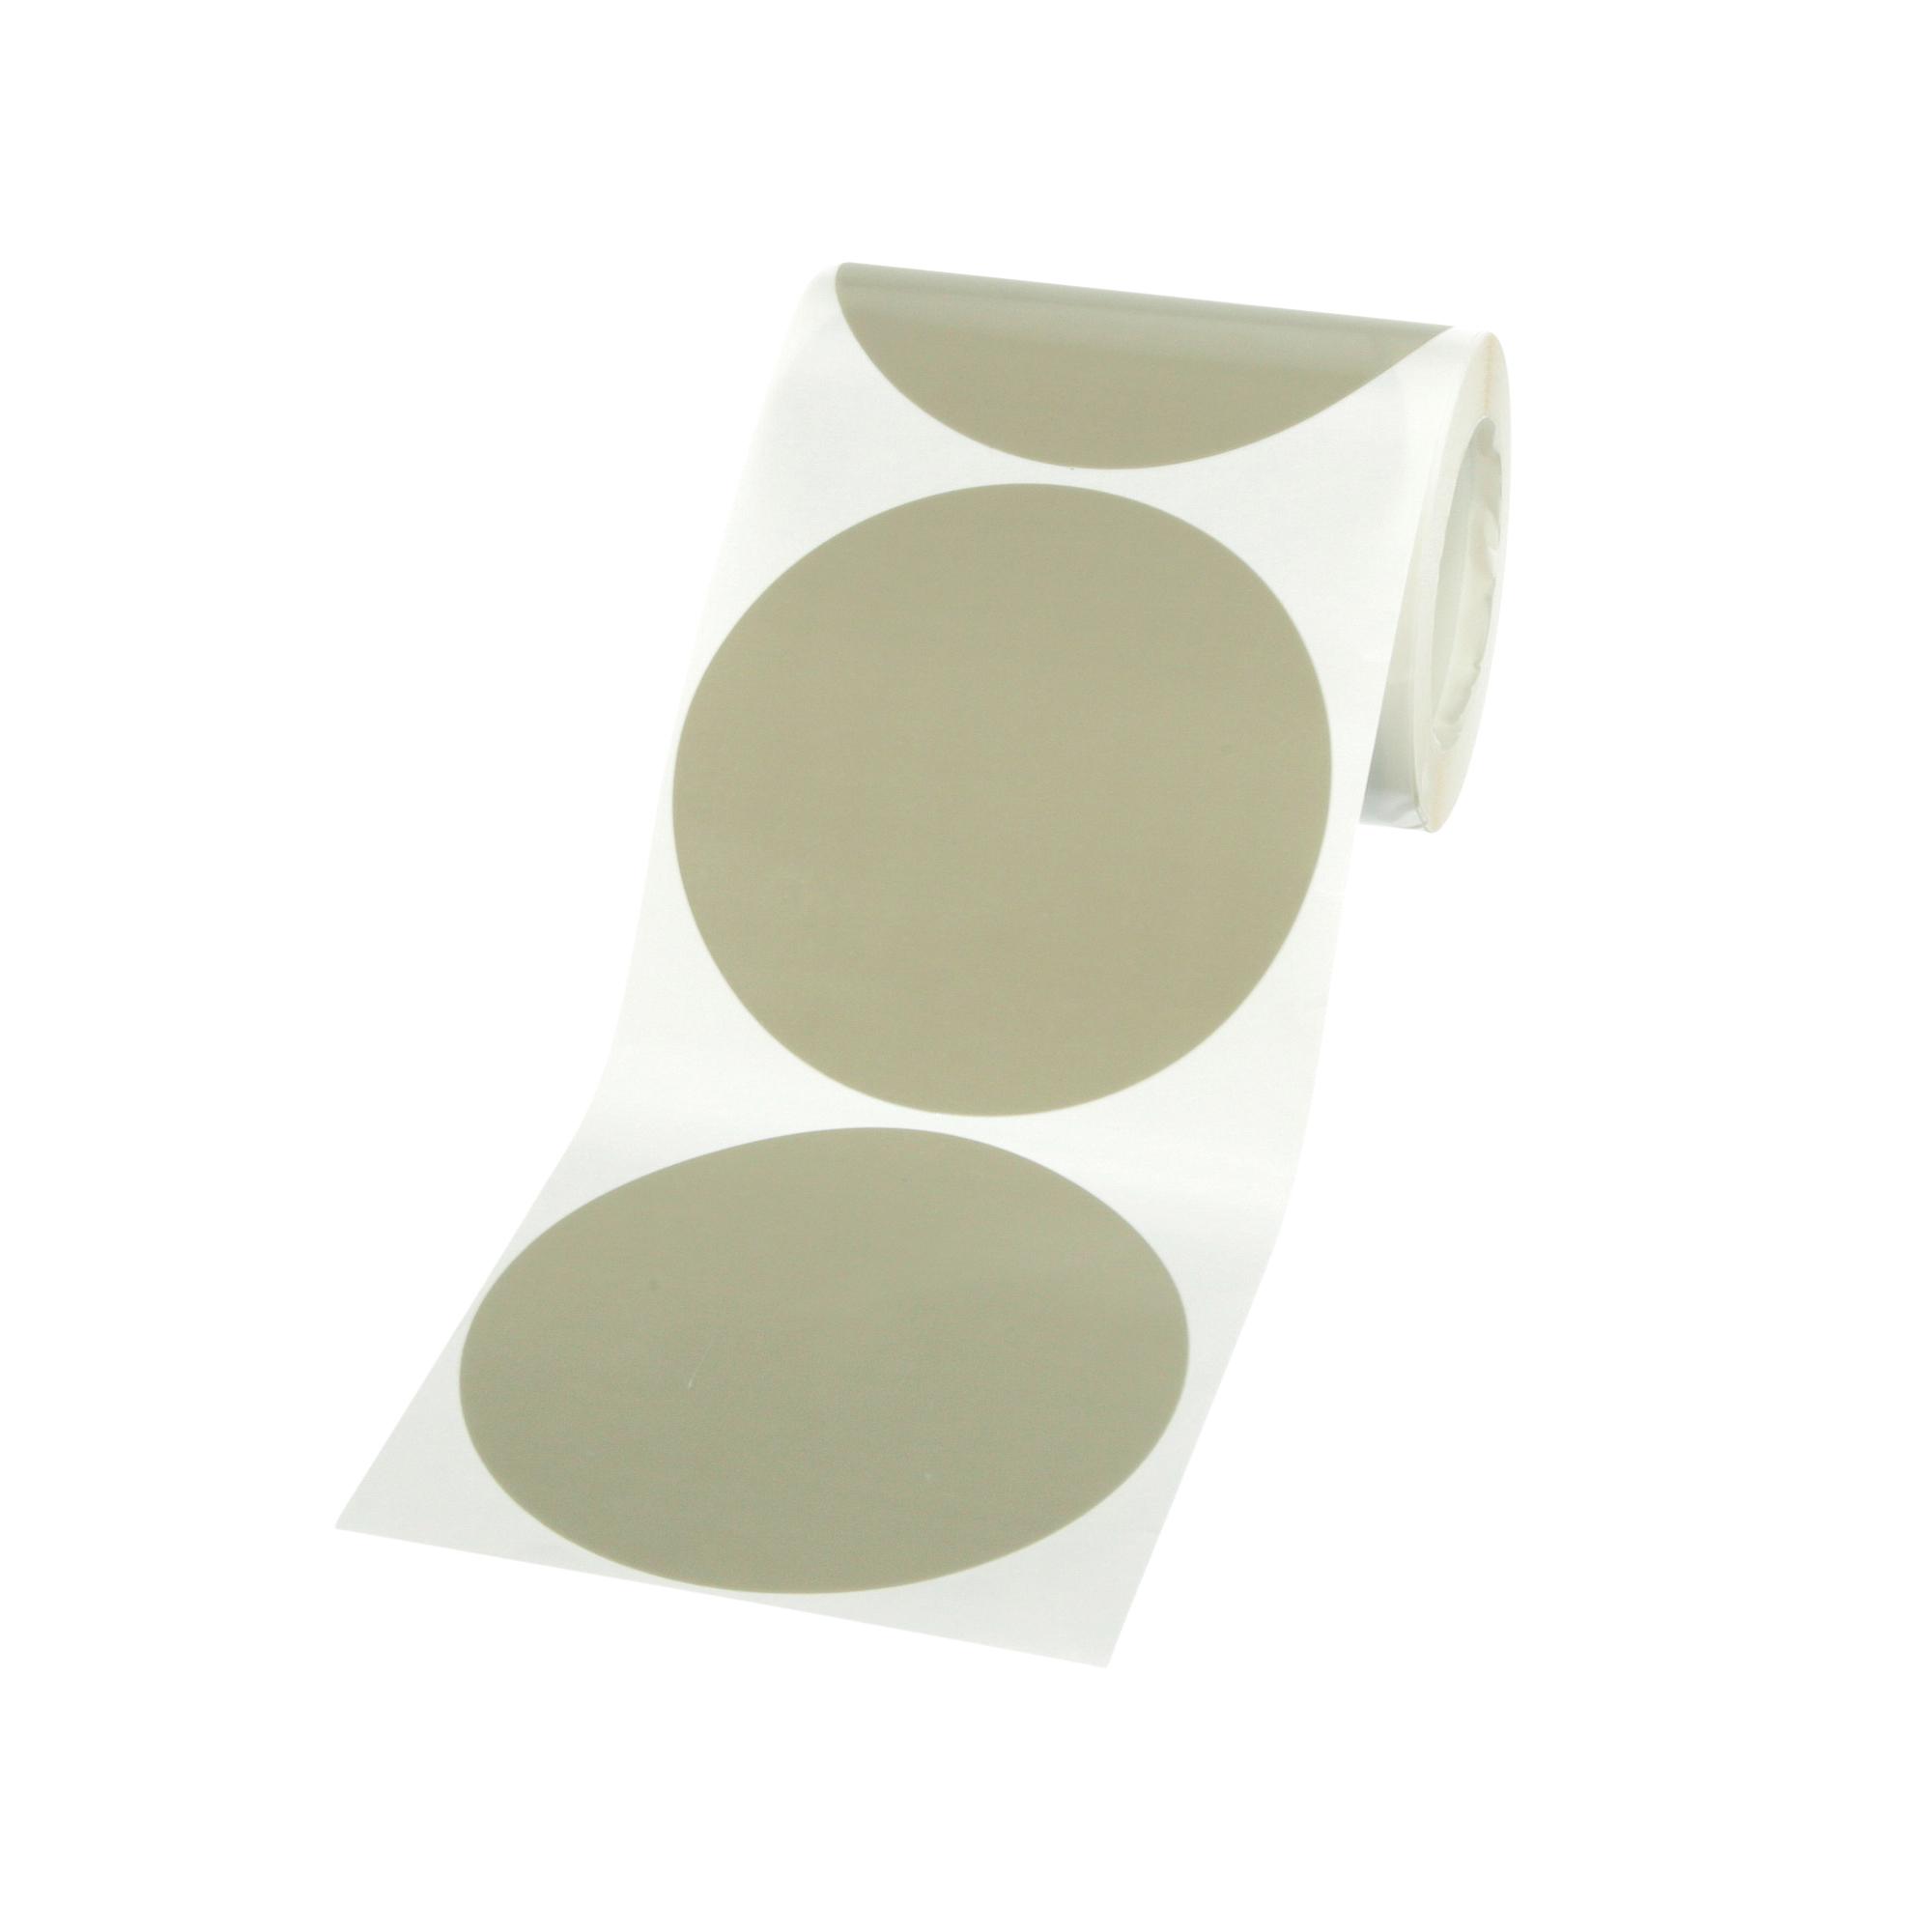 Trizact™ Fullflex 051119-80702 237AA File Fullflex Scalloped Edge Coated Abrasive Belt, 1/2 in W x 24 in L, A6 Grit, Ultra Fine Grade, Aluminum Oxide Abrasive, Cloth Backing